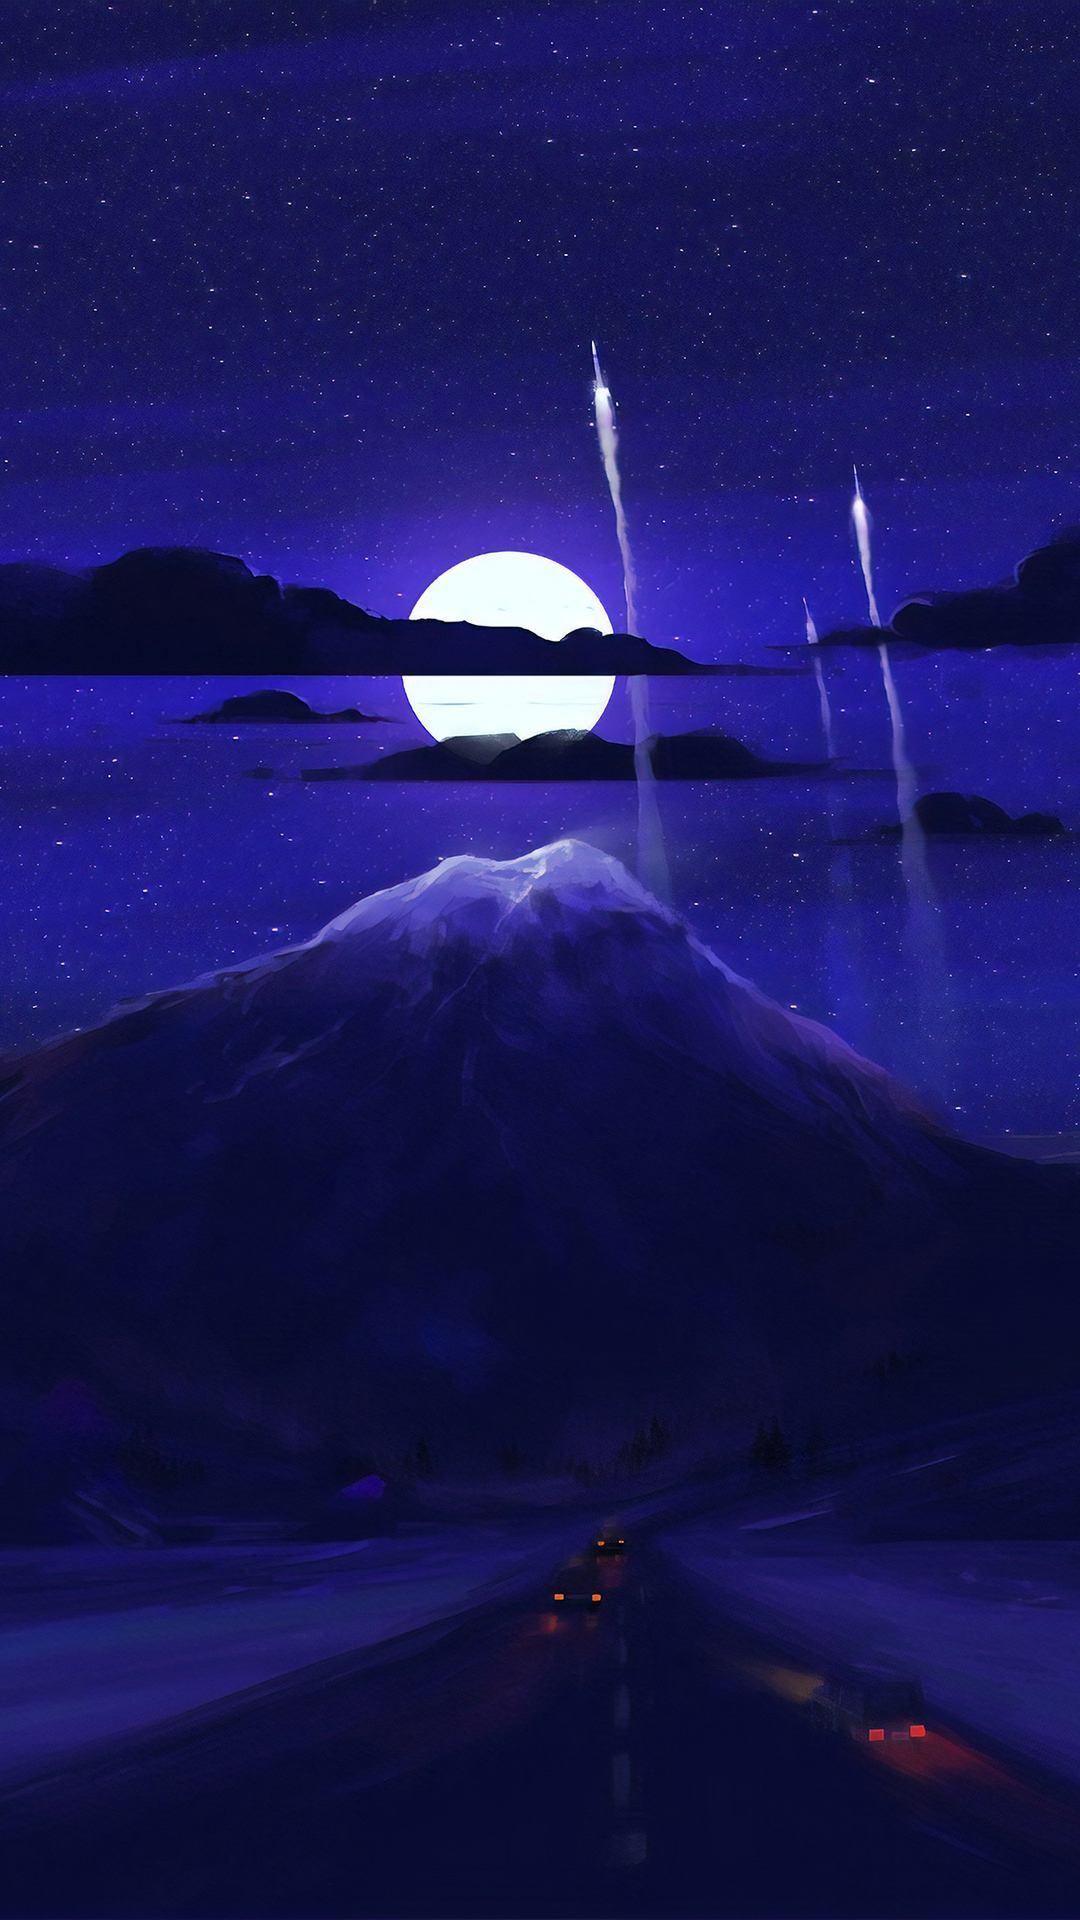 dark moon night minimal art d8 1080x1920 - Pack de Fondos de Pantalla Minimalistas (+100 Imagenes)